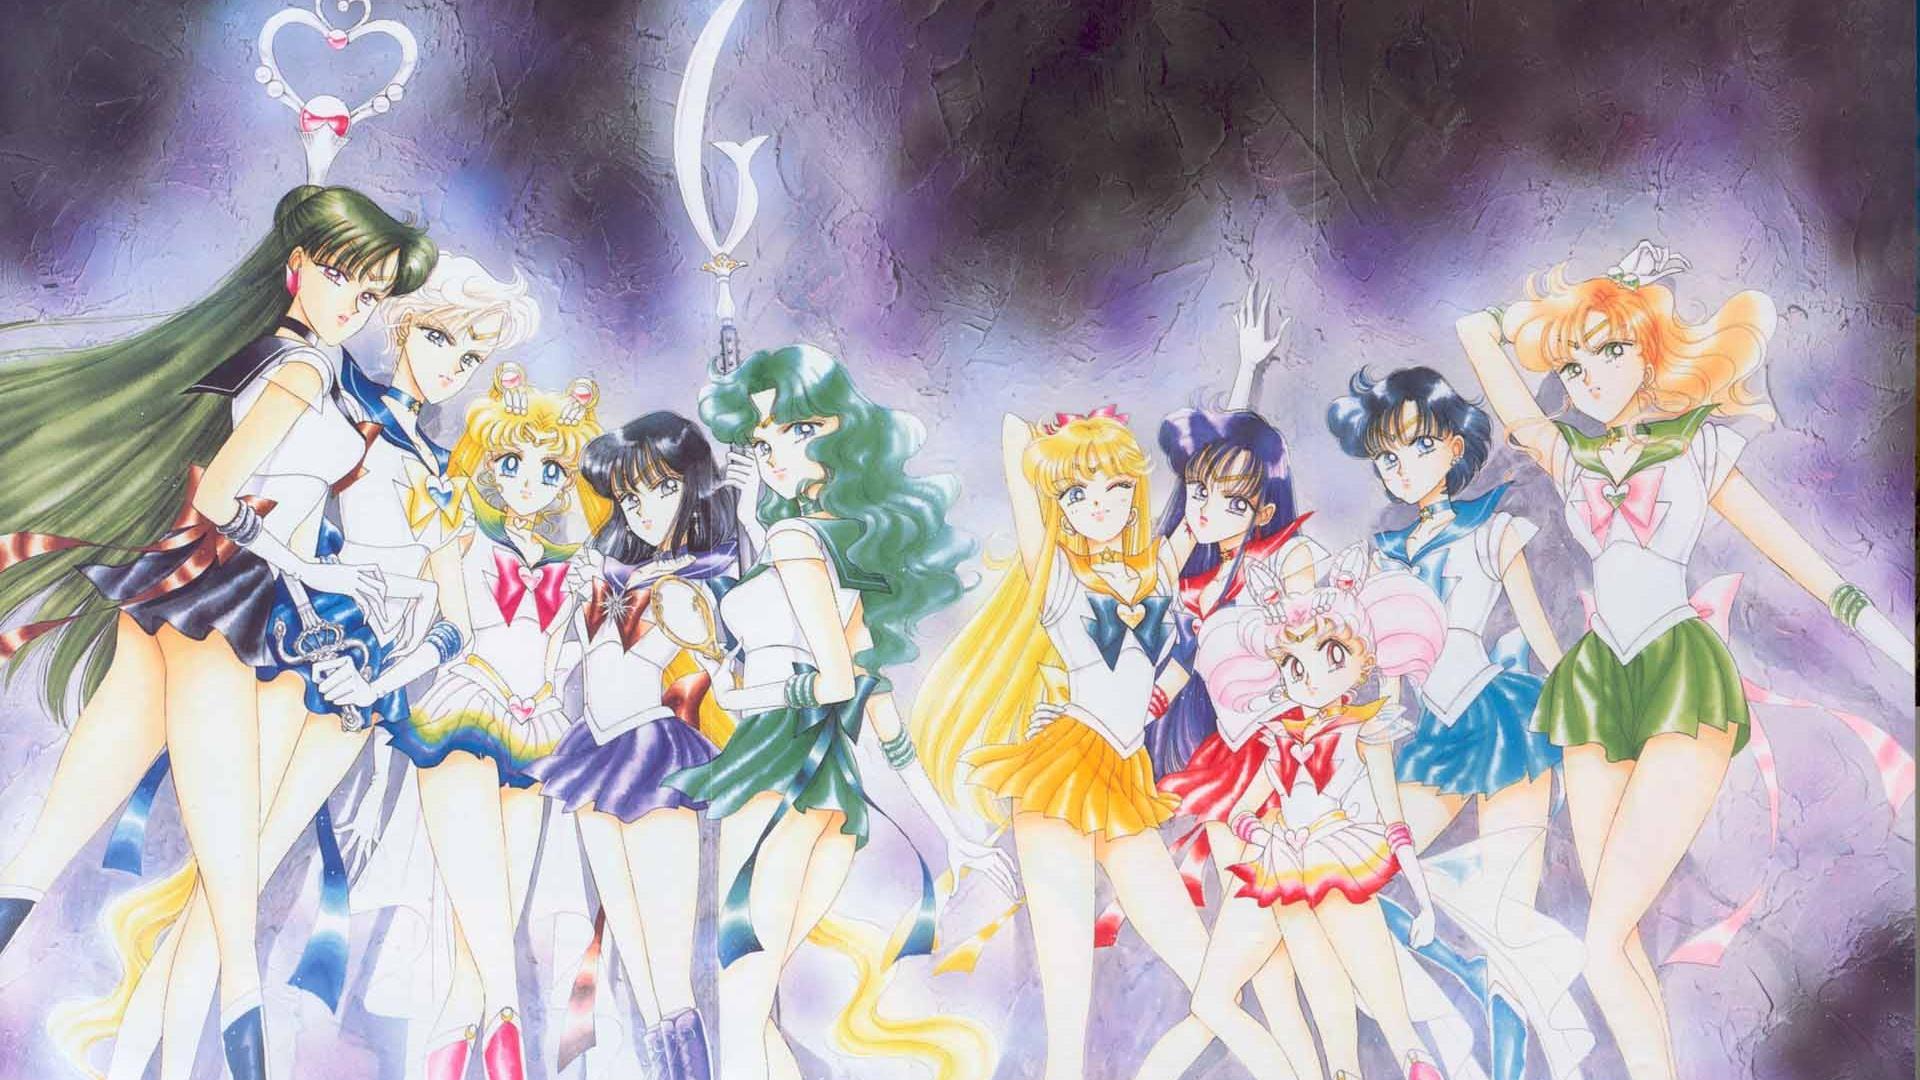 Sailor Moon wallpapers hd 1920x1080